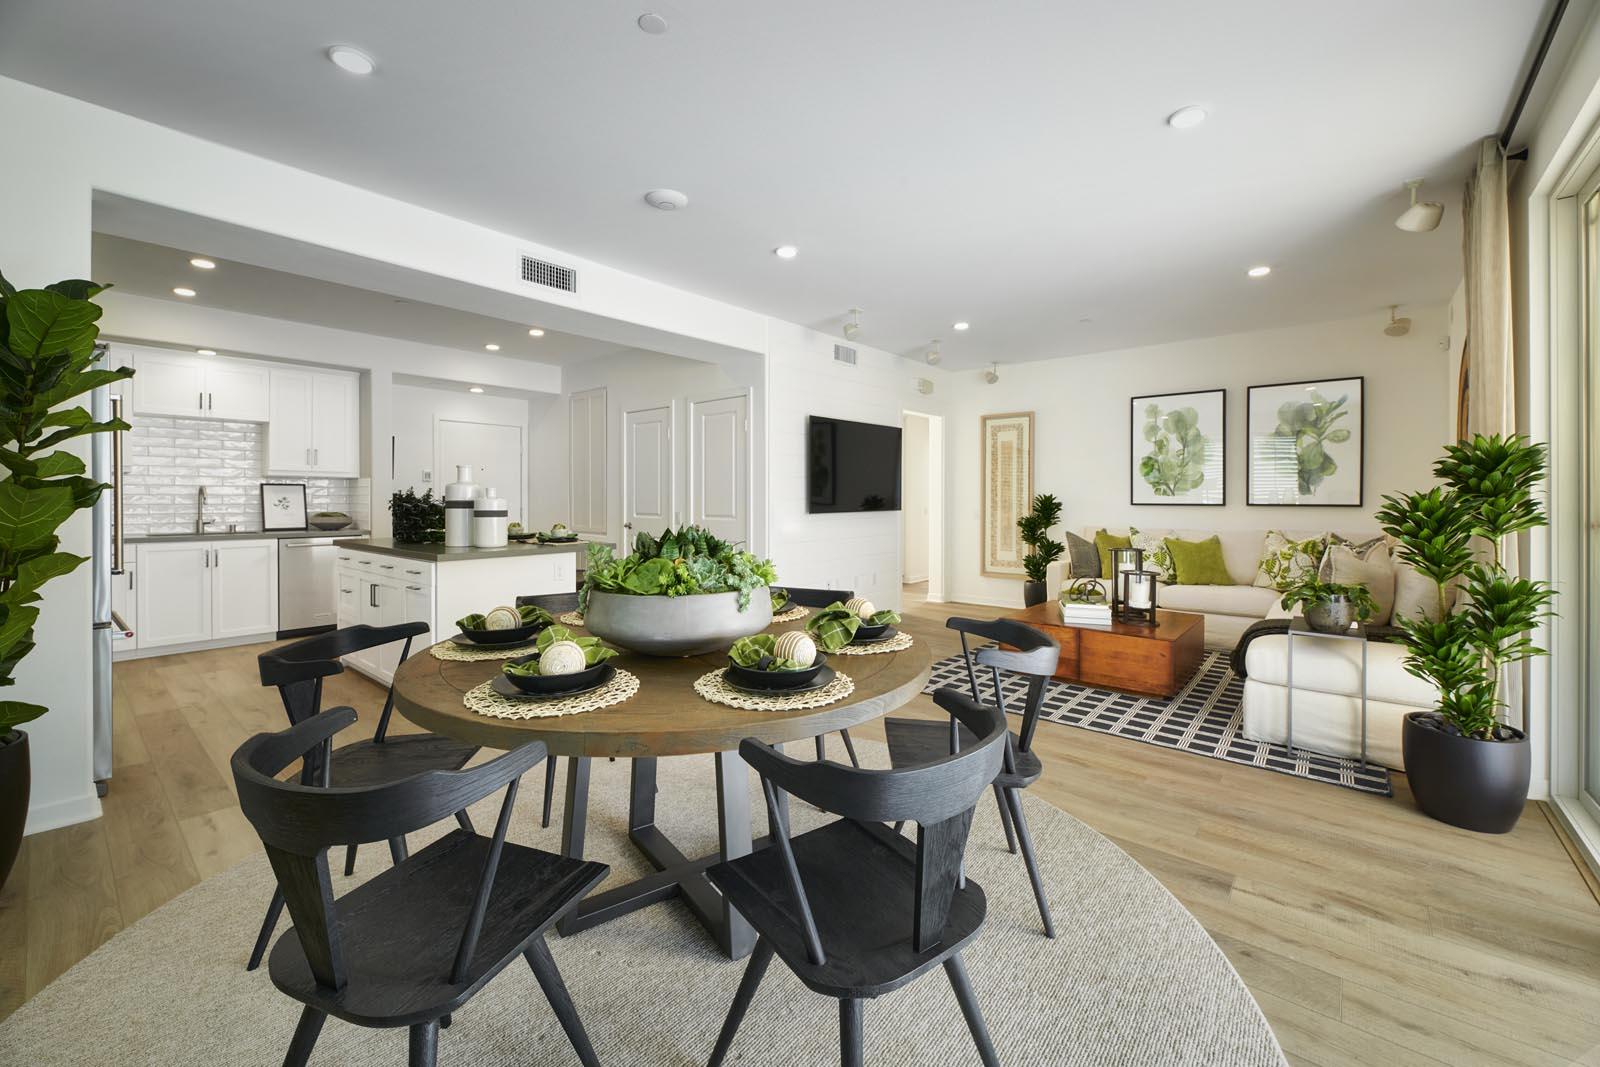 Dining Area | Residence 3 | Aspire | New Homes in Rancho Cucamonga, CA | Van Daele Homes